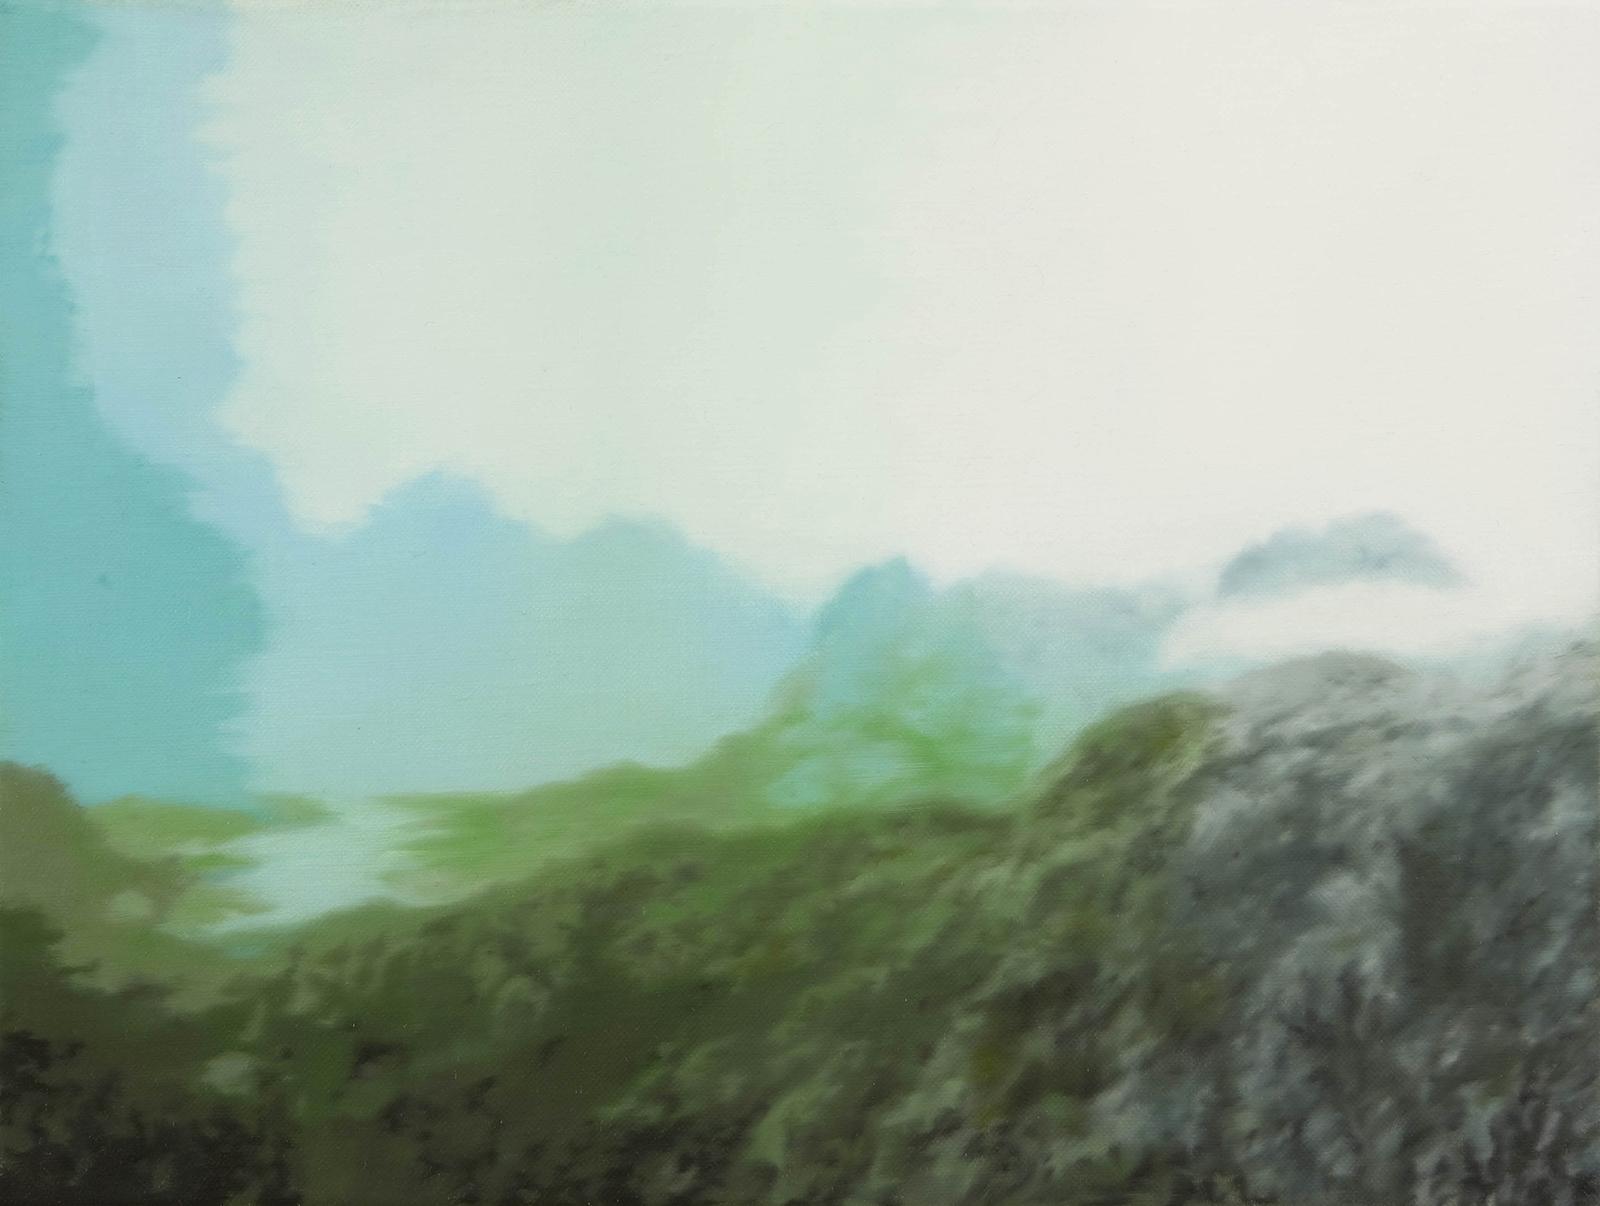 Fjordlandschaft 2006, 30 x 40 cm, Öl auf Leinwand  Fjord Landscape 2006, oil on canvas